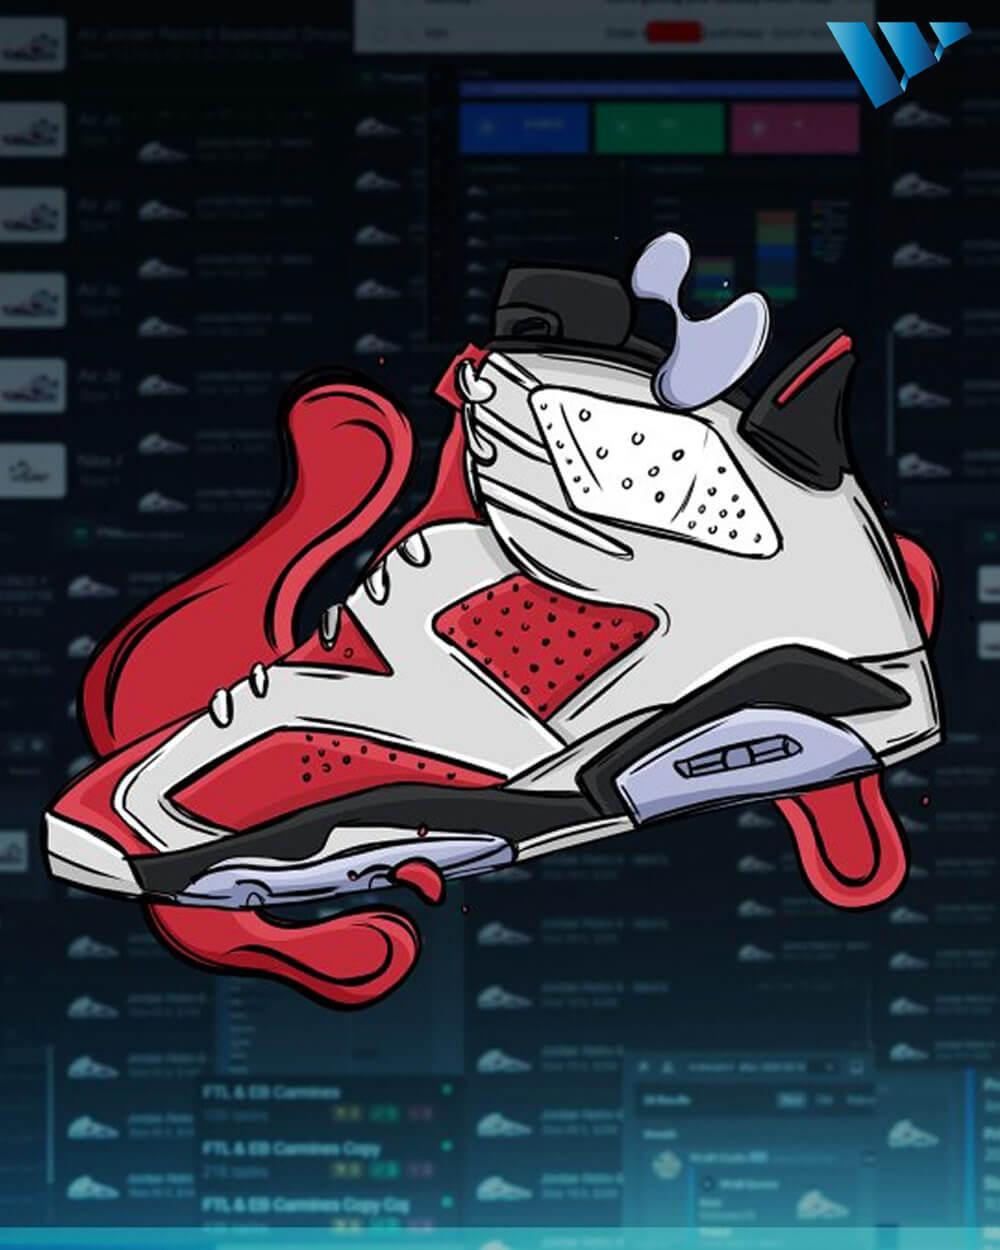 Wrath sneaker bot